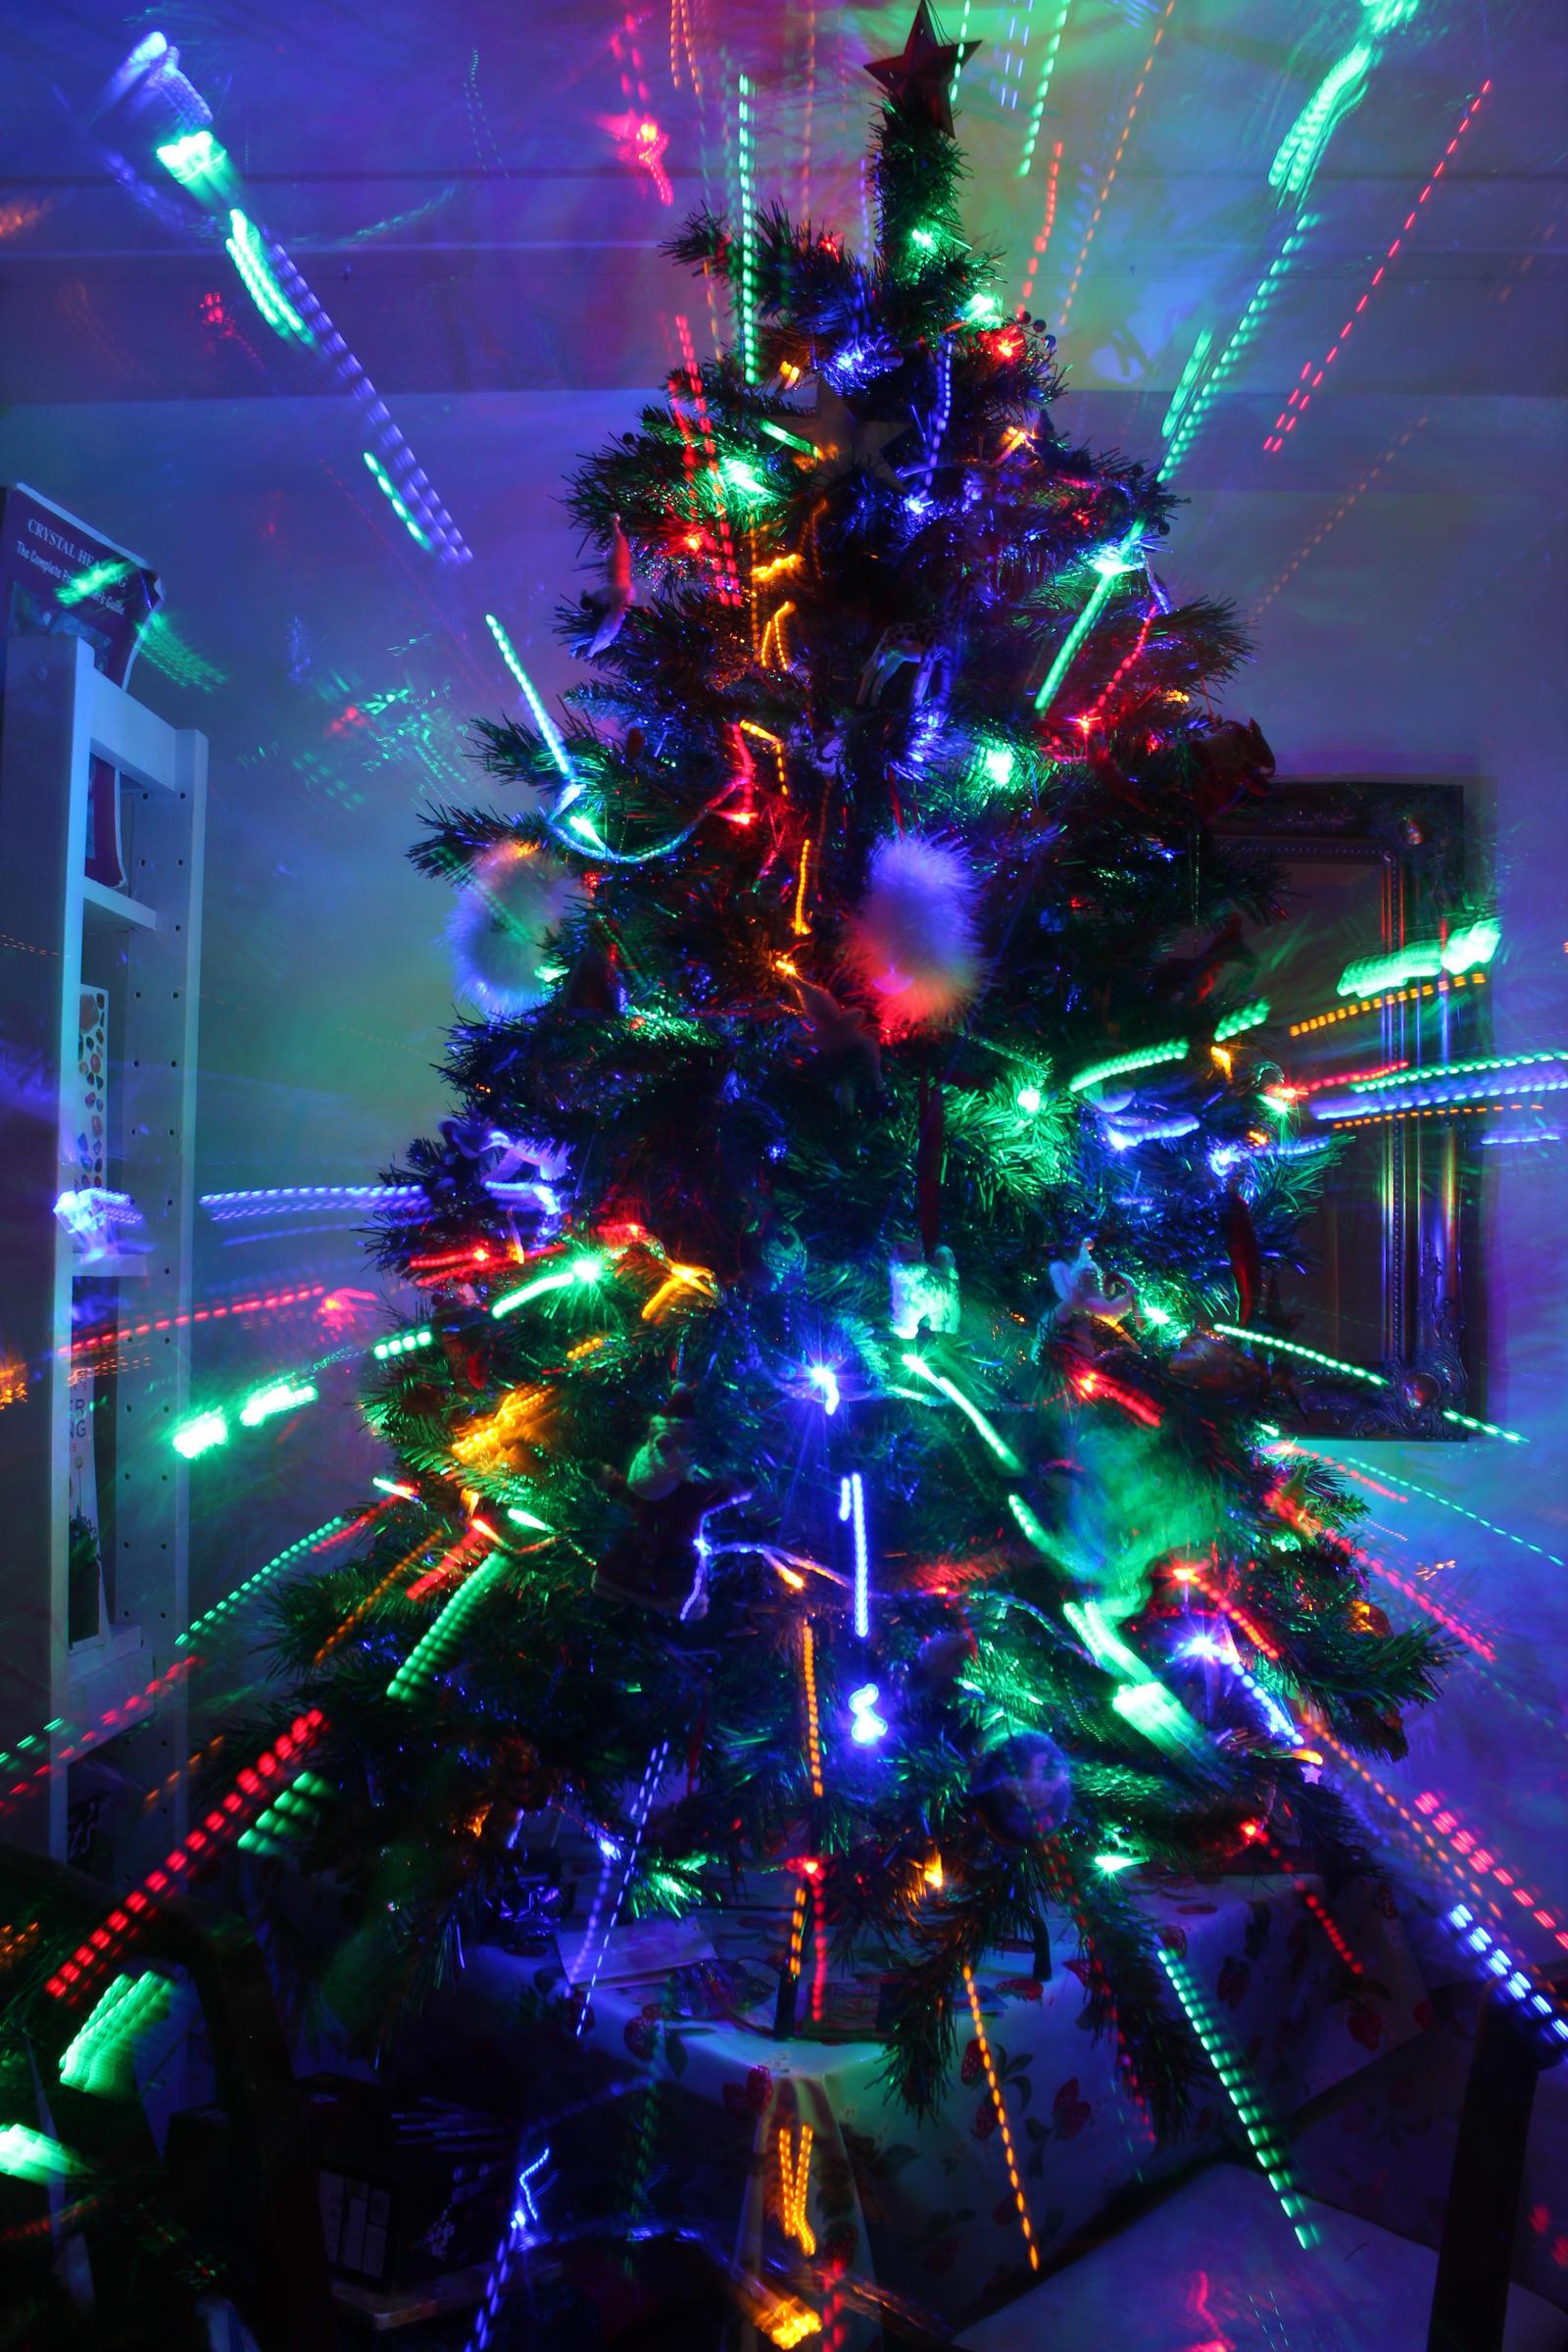 blackrainbow christmas trees - photo #29